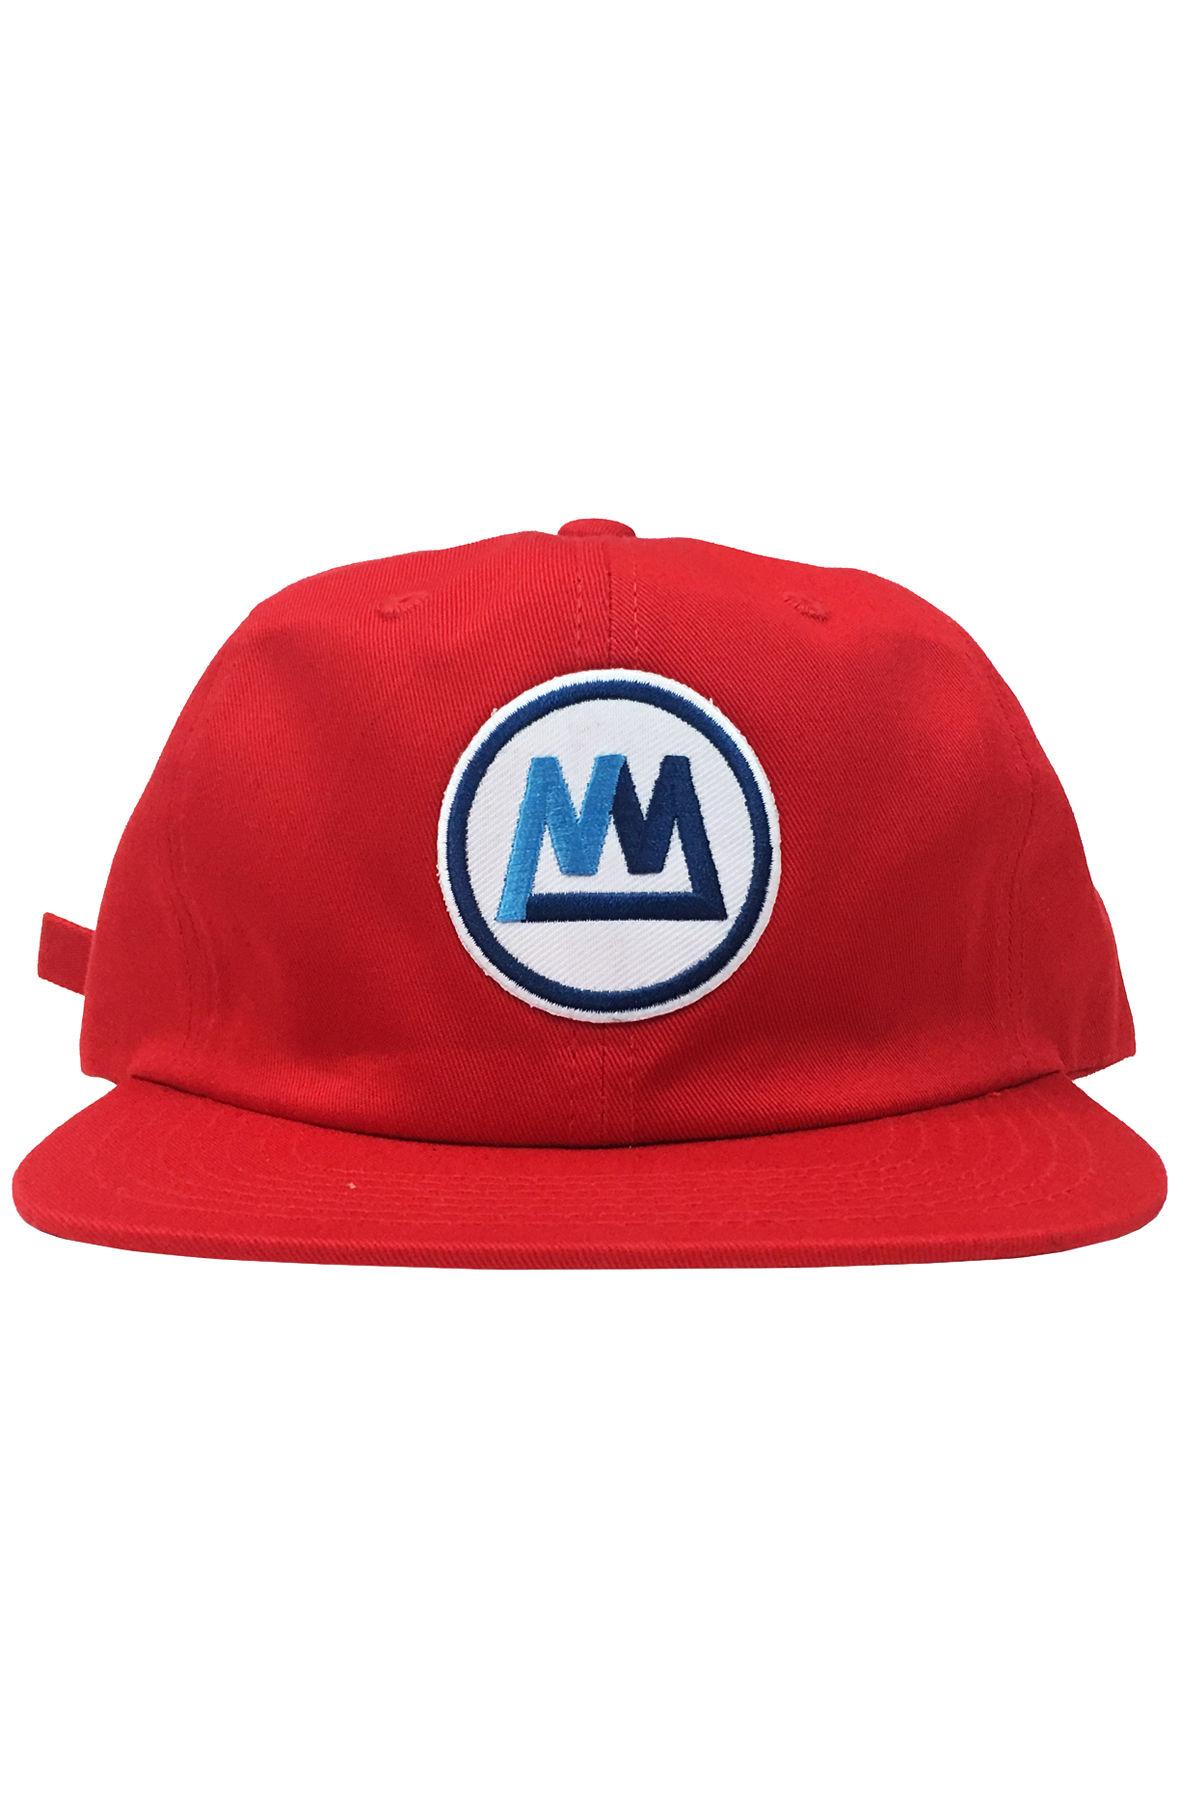 Image of Metro Strapback Hat